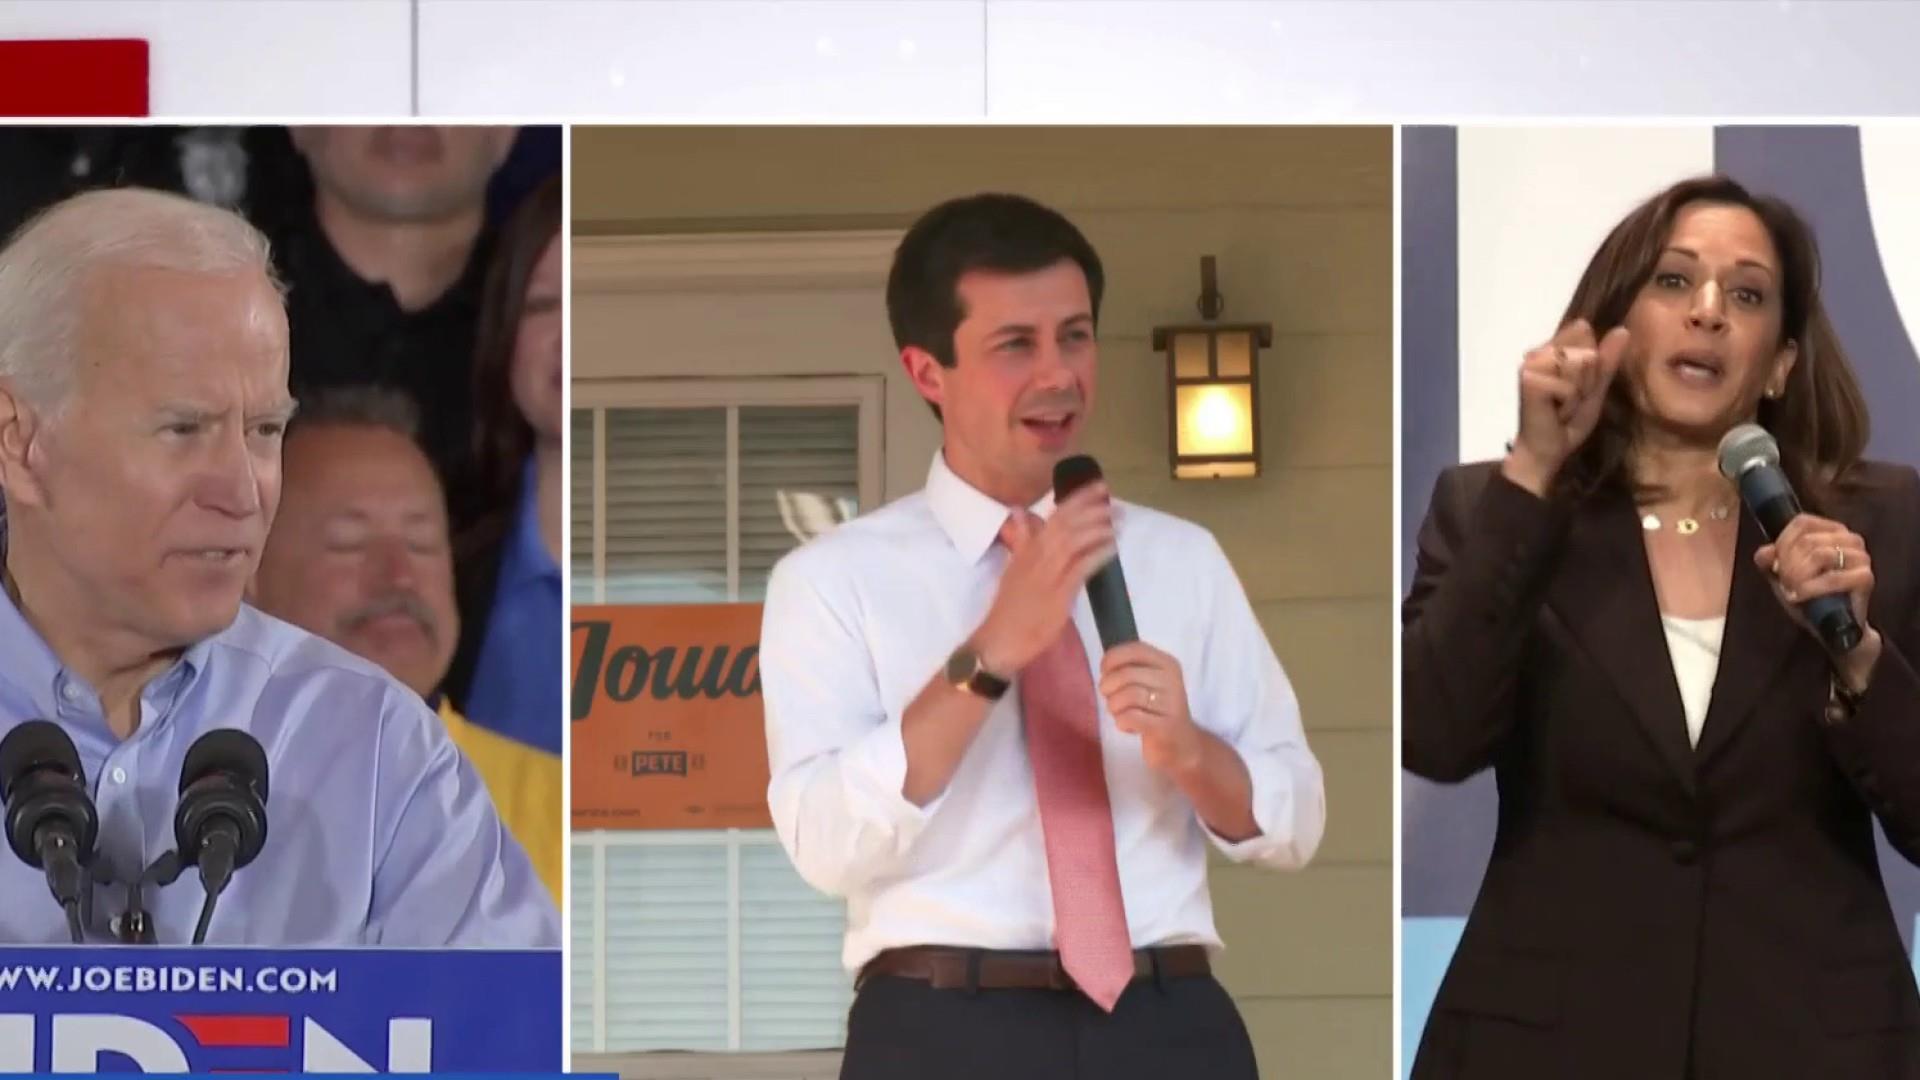 NYT: Big New York donors favoring Biden, Buttigieg, Harris